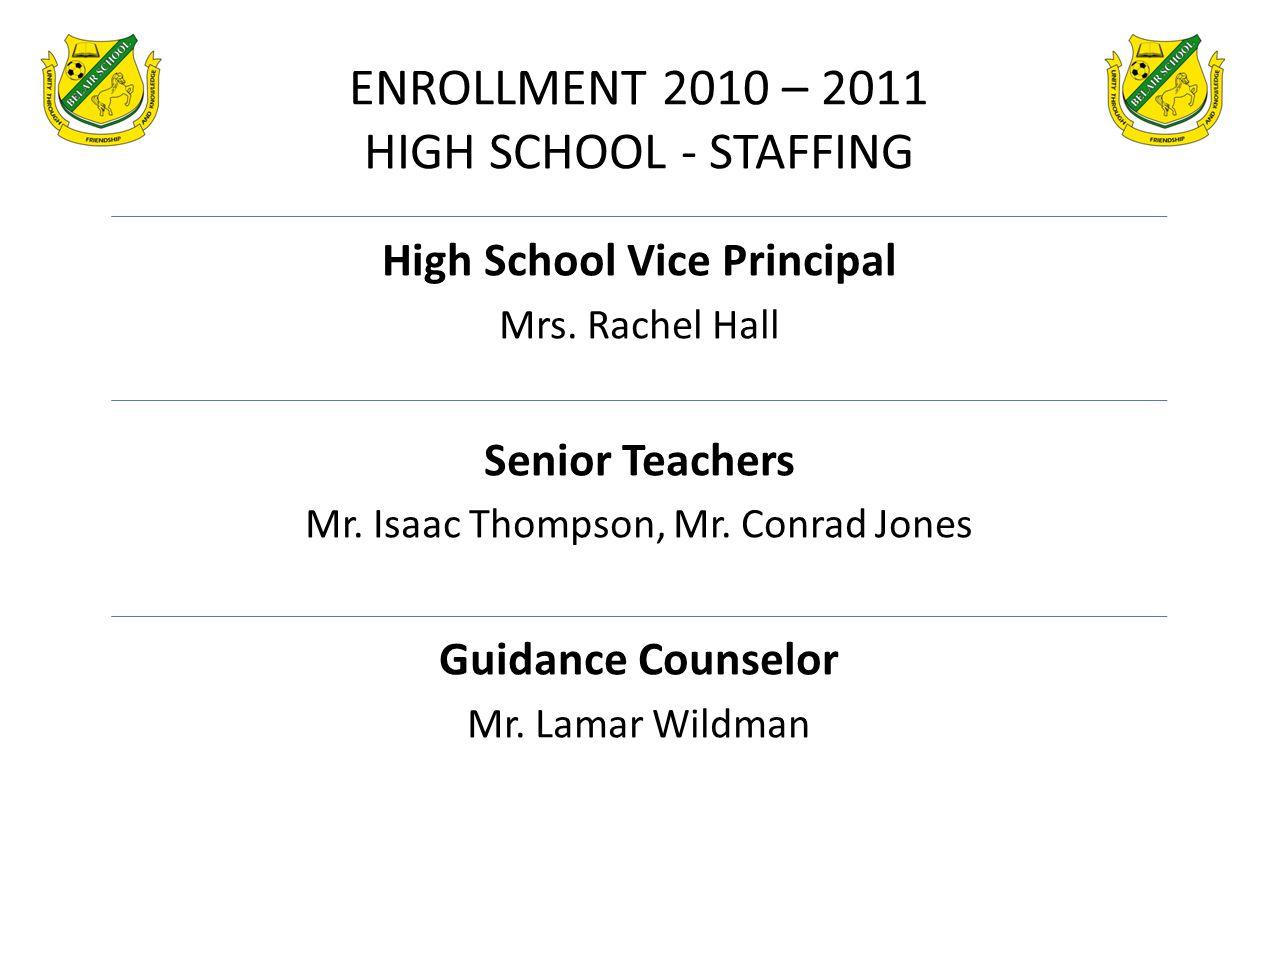 High School Vice Principal Mrs. Rachel Hall Senior Teachers Mr. Isaac Thompson, Mr. Conrad Jones Guidance Counselor Mr. Lamar Wildman ENROLLMENT 2010